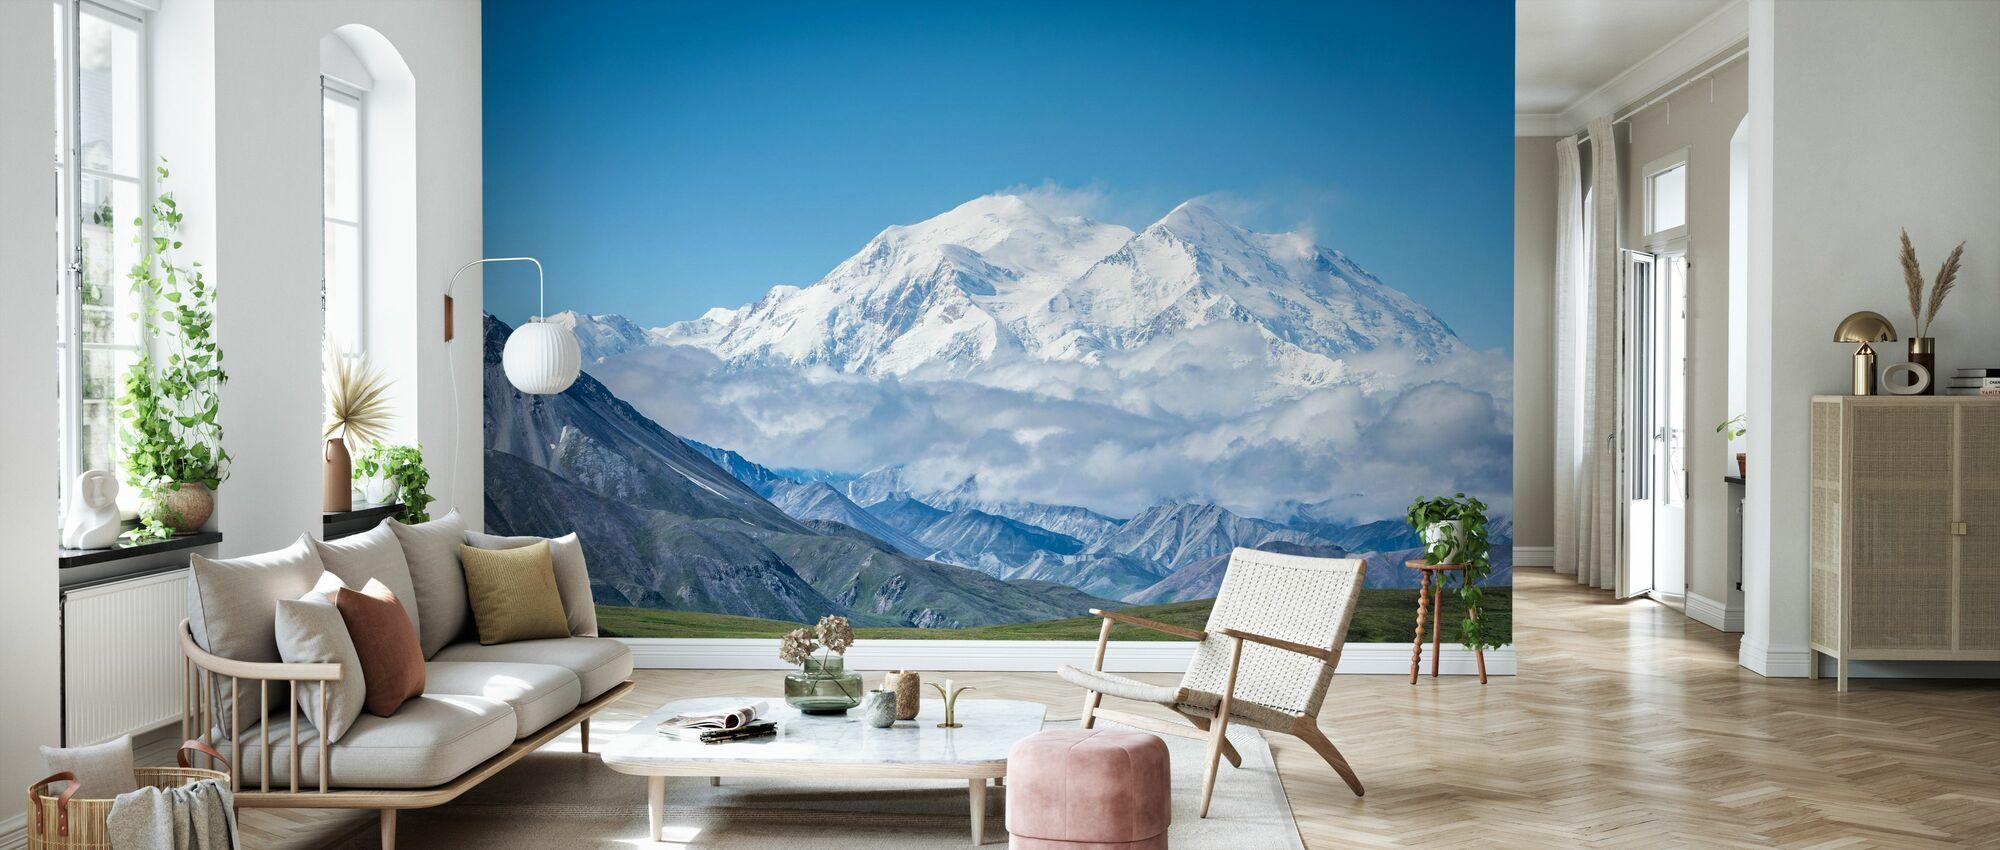 Mt Denali Alaska - Tapet - Stue